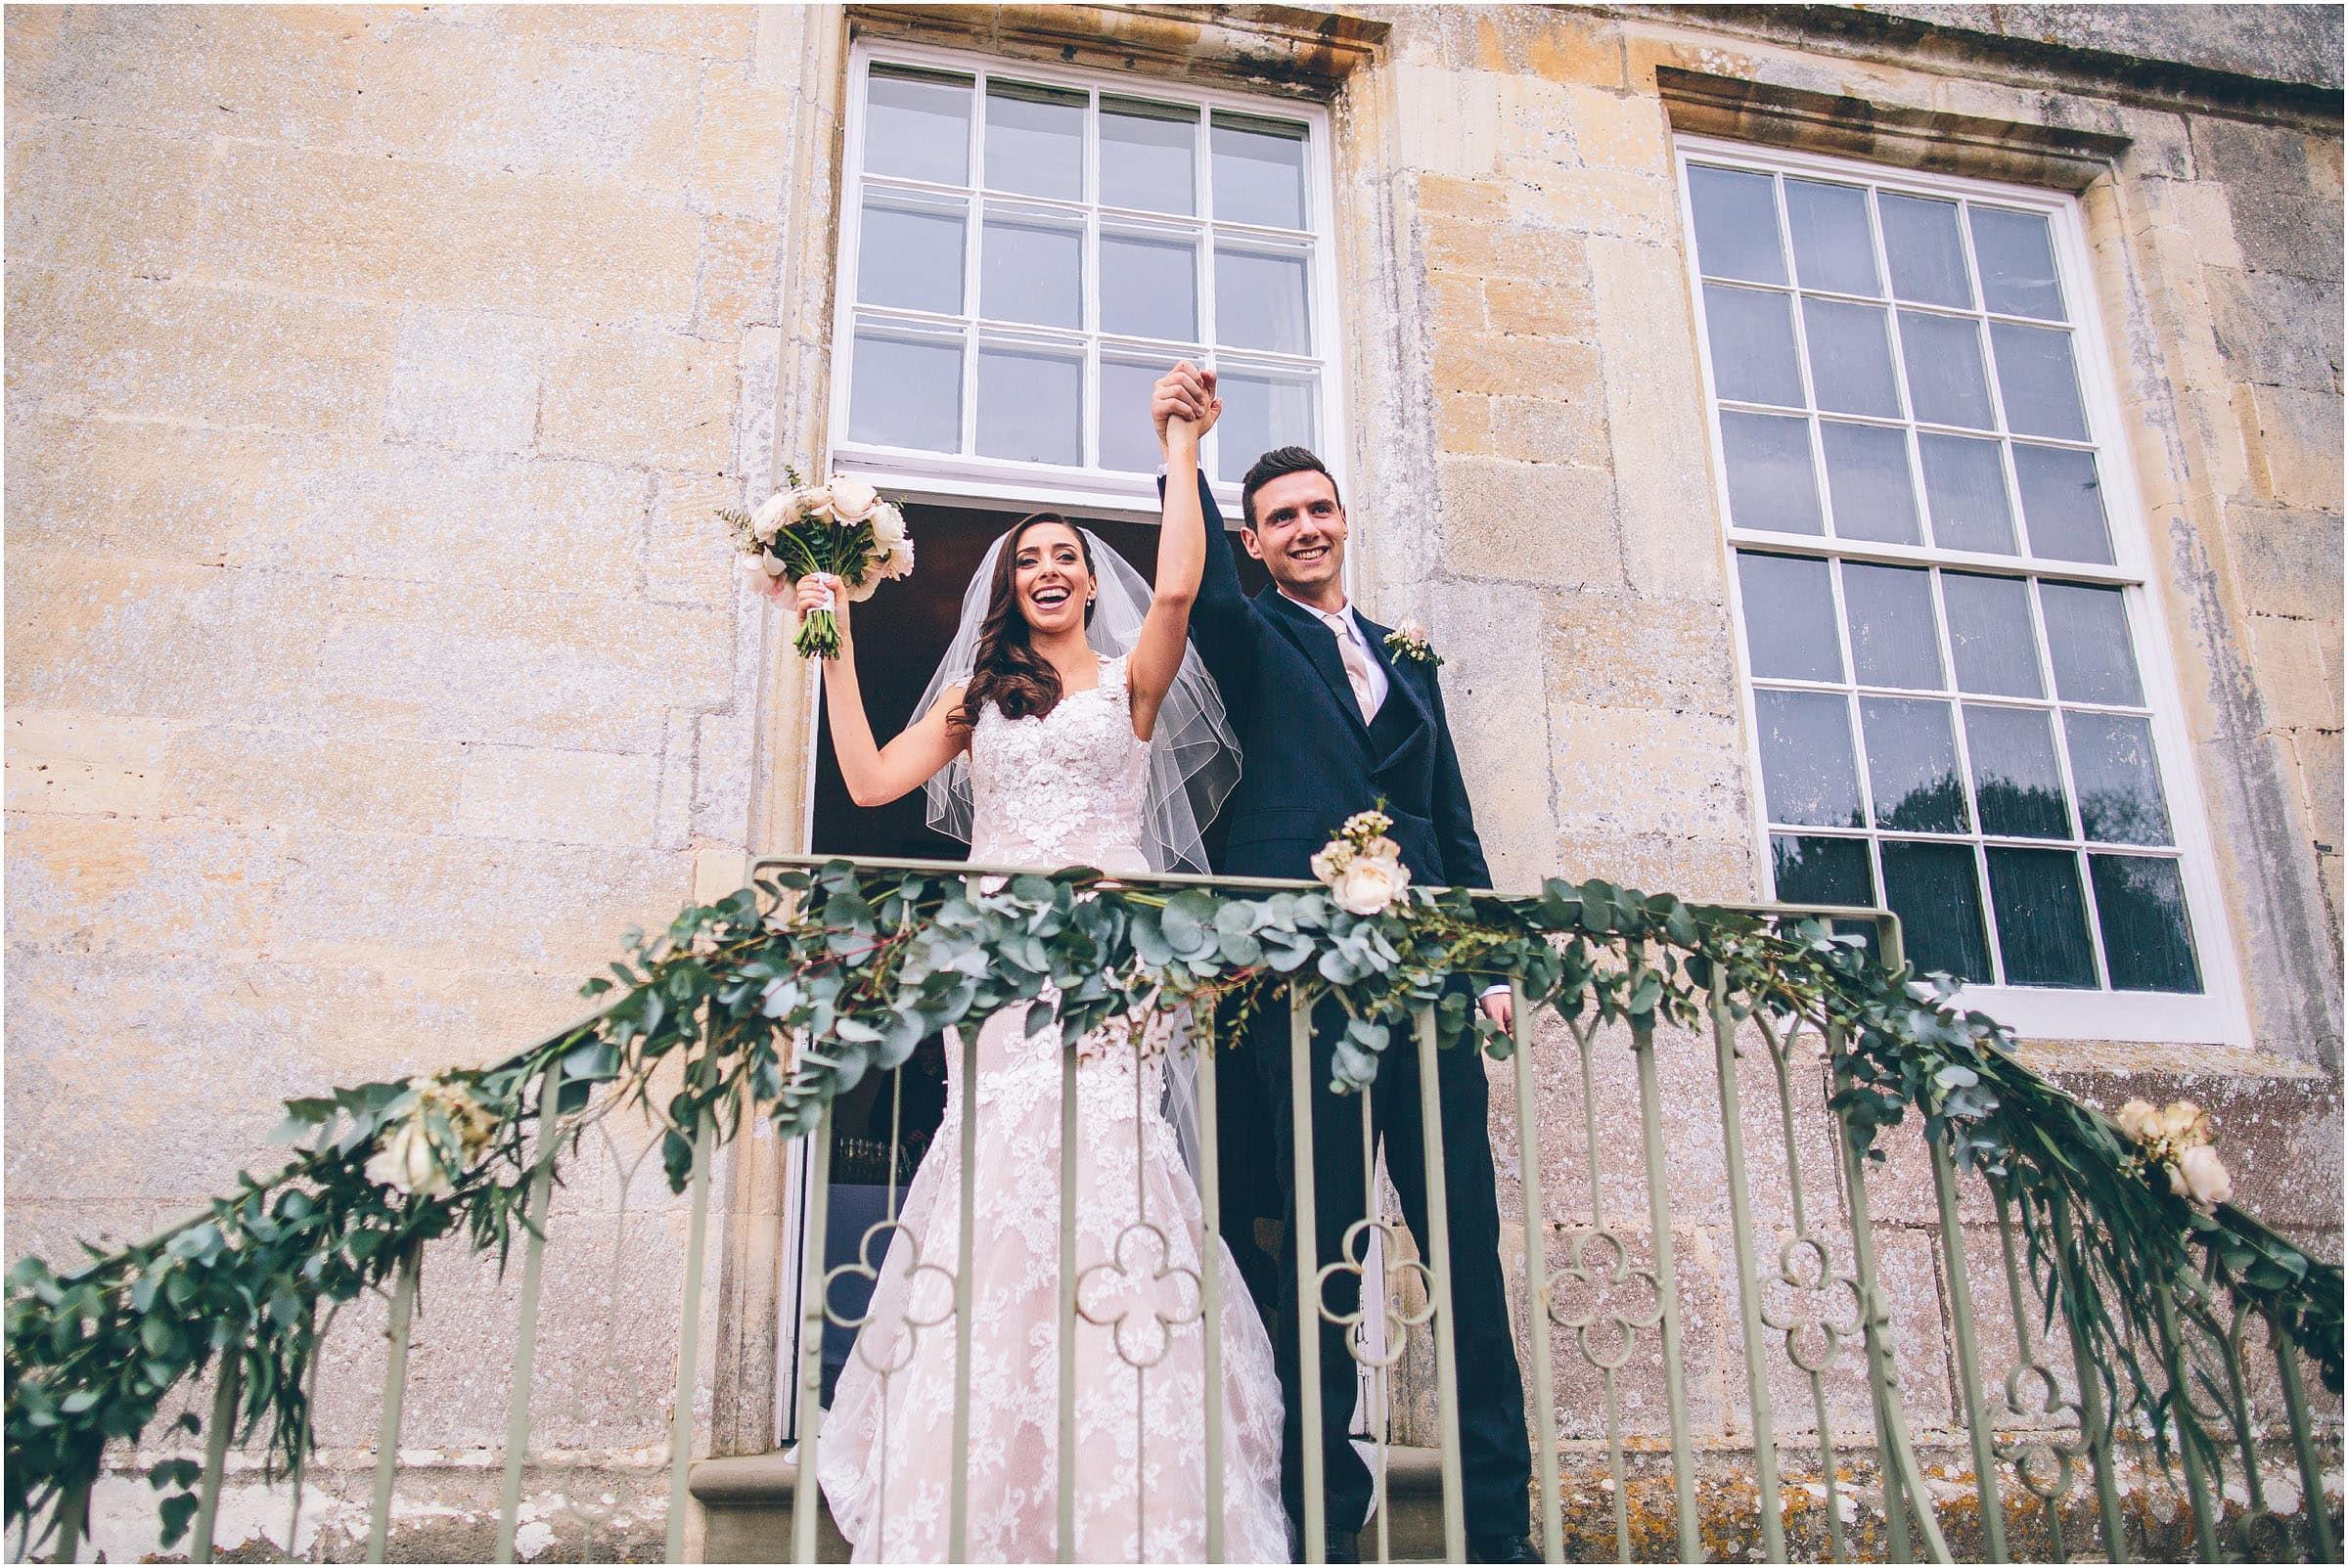 Elmore_Court_Wedding_Photography_0058